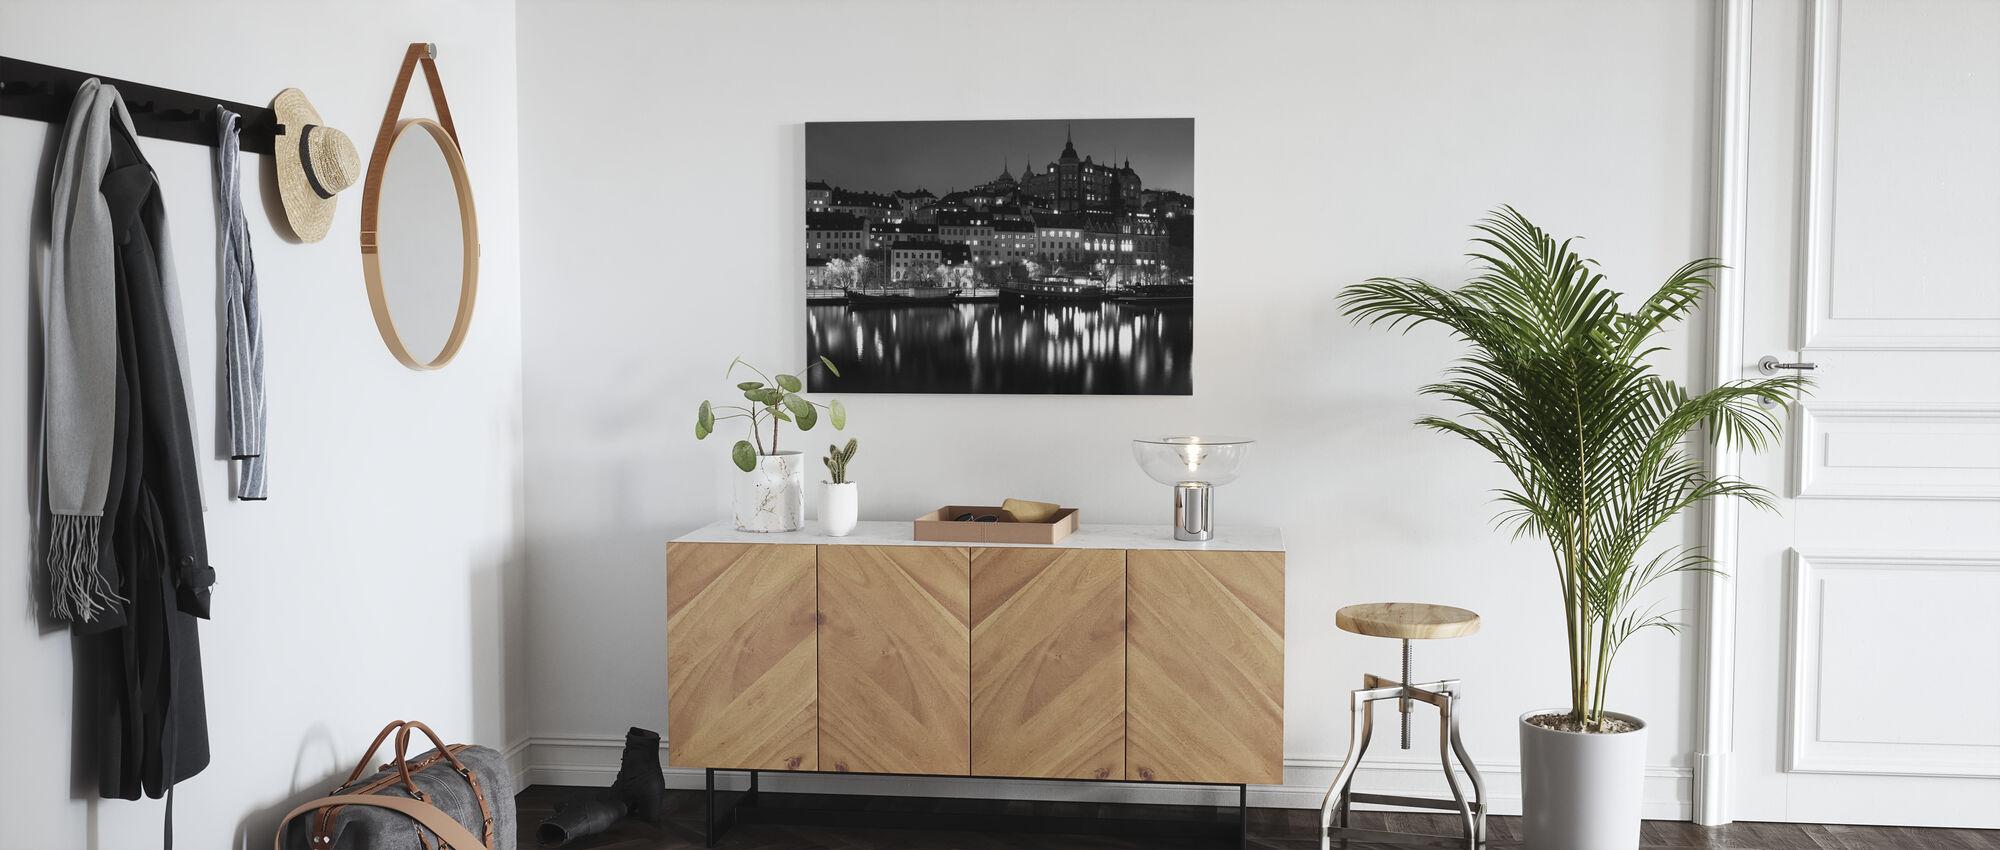 Luci a Stoccol - Stampa su tela - Sala